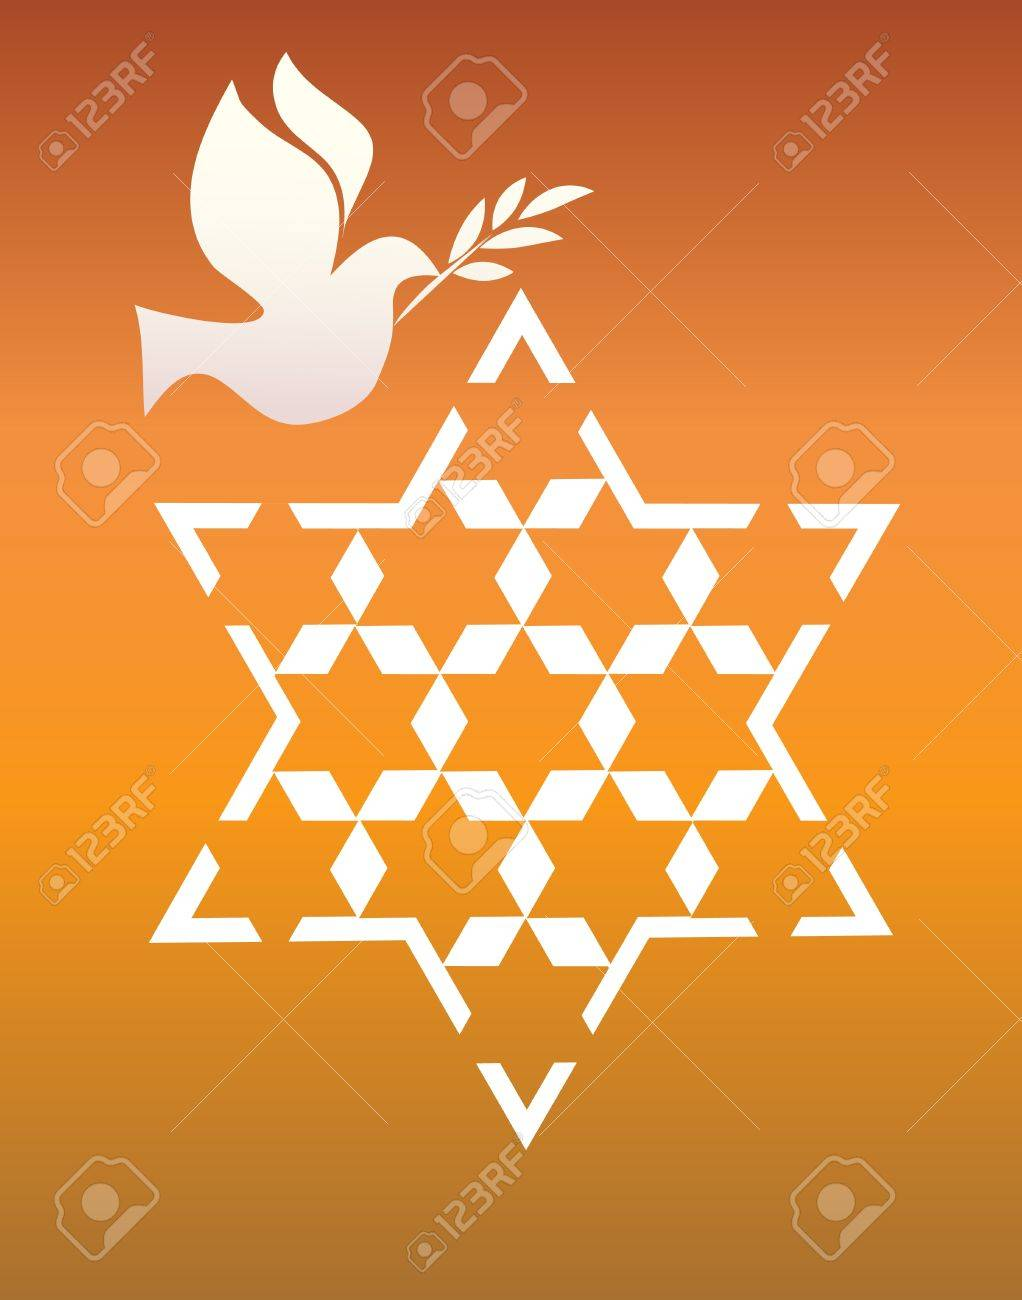 peace pigeon with david star on orange Stock Vector - 13180187